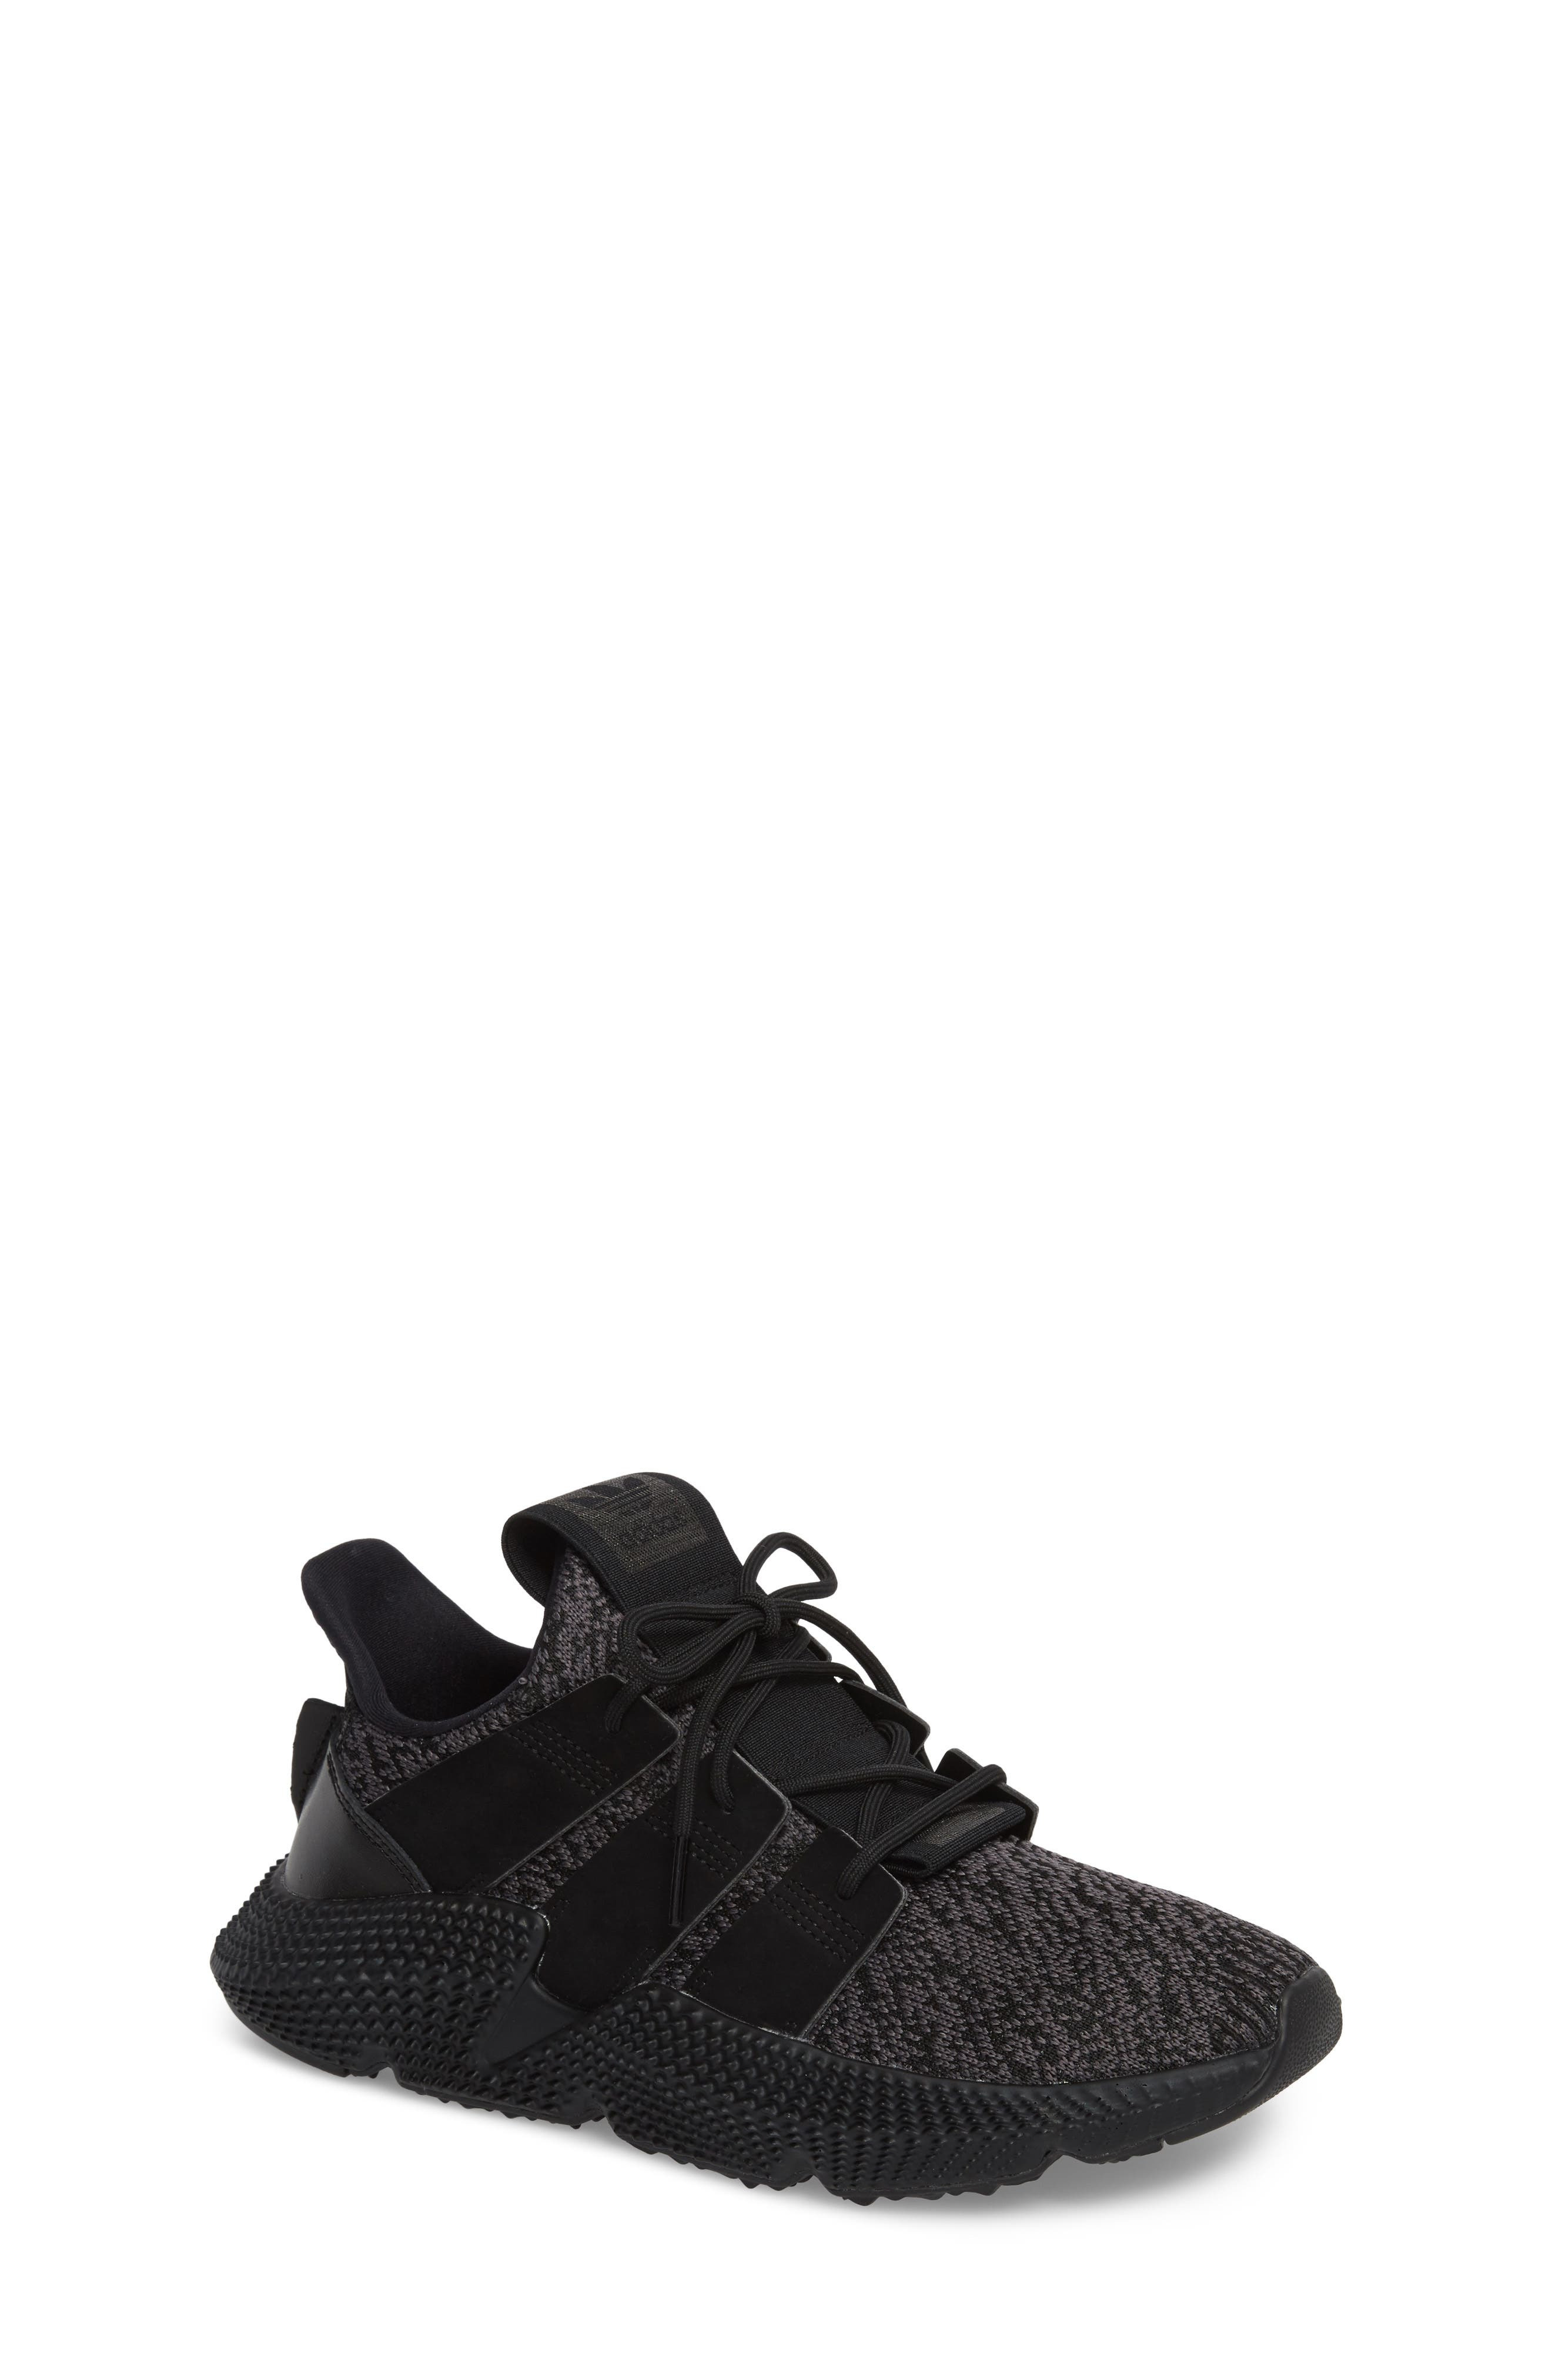 Prophere Sneaker,                             Main thumbnail 1, color,                             001